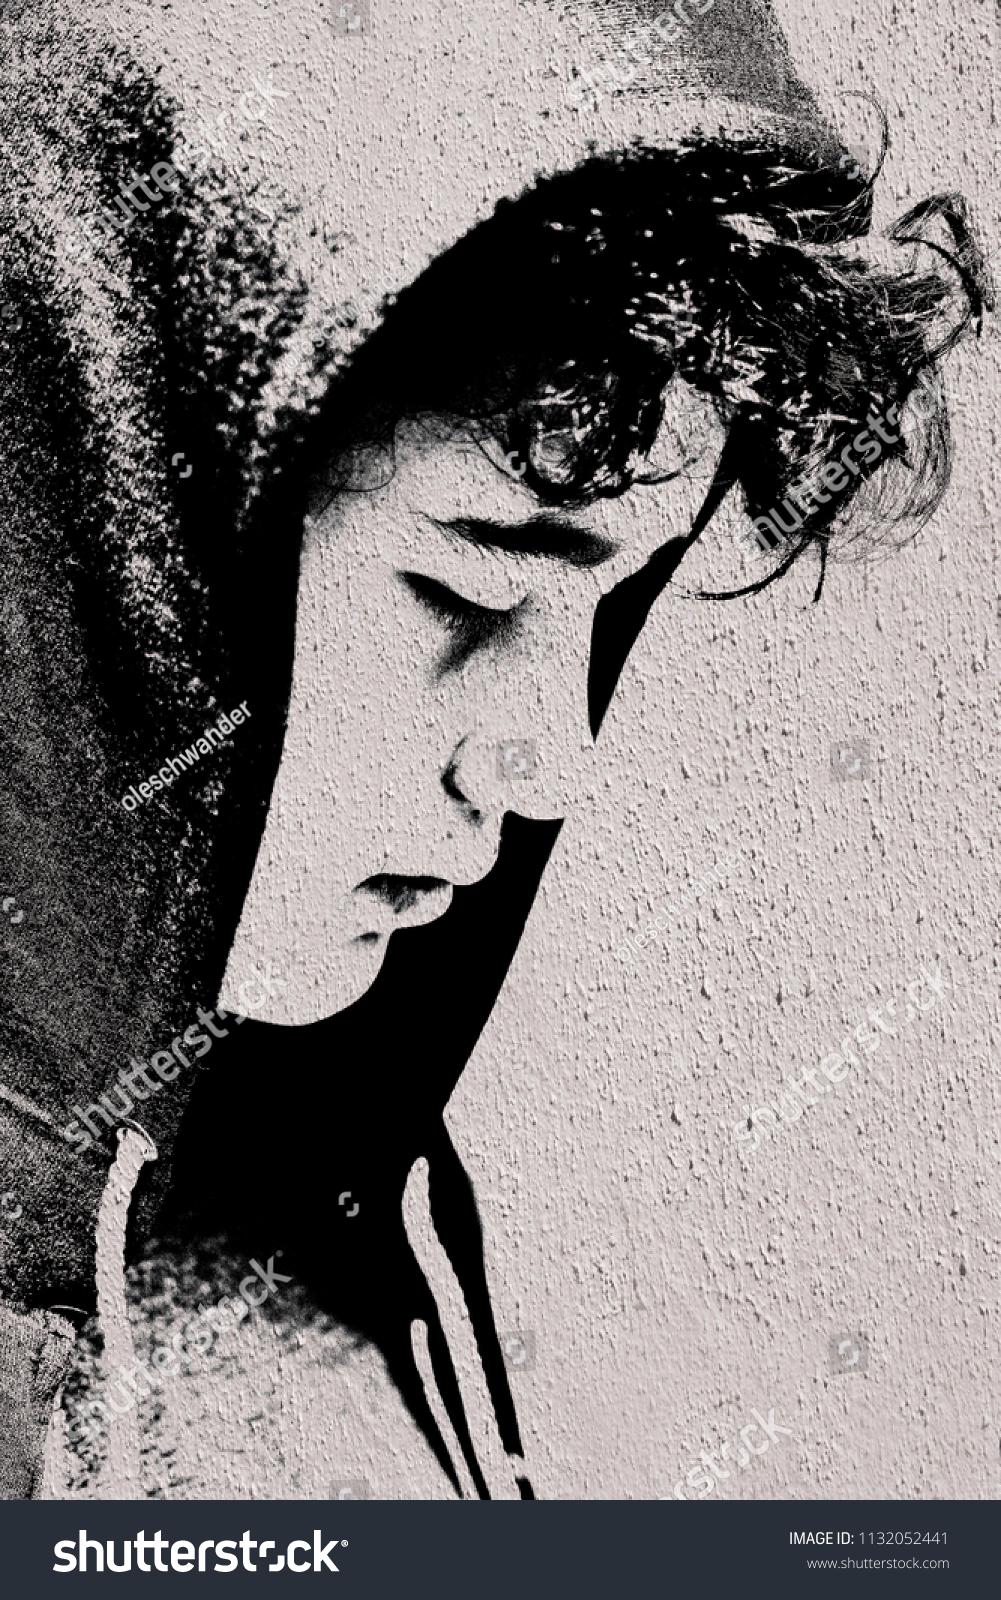 Sad troubled teenager school boy hood stock photo edit now